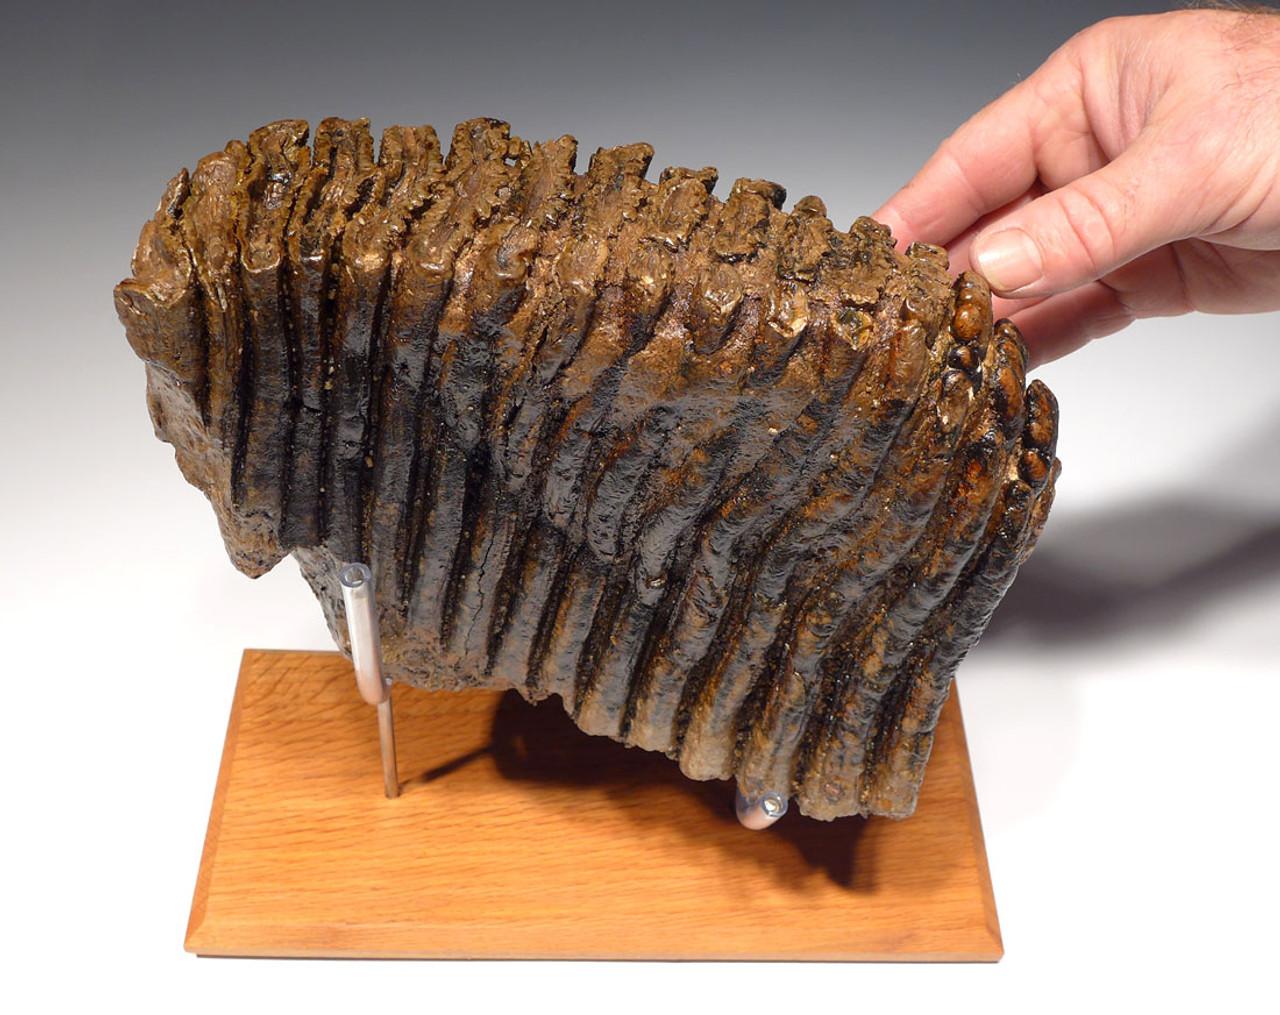 MRX001 - EXTREMELY RARE PALAEOLOXODON ANTIQUUS FOSSIL ELEPHANT TOOTH FROM GERMANY